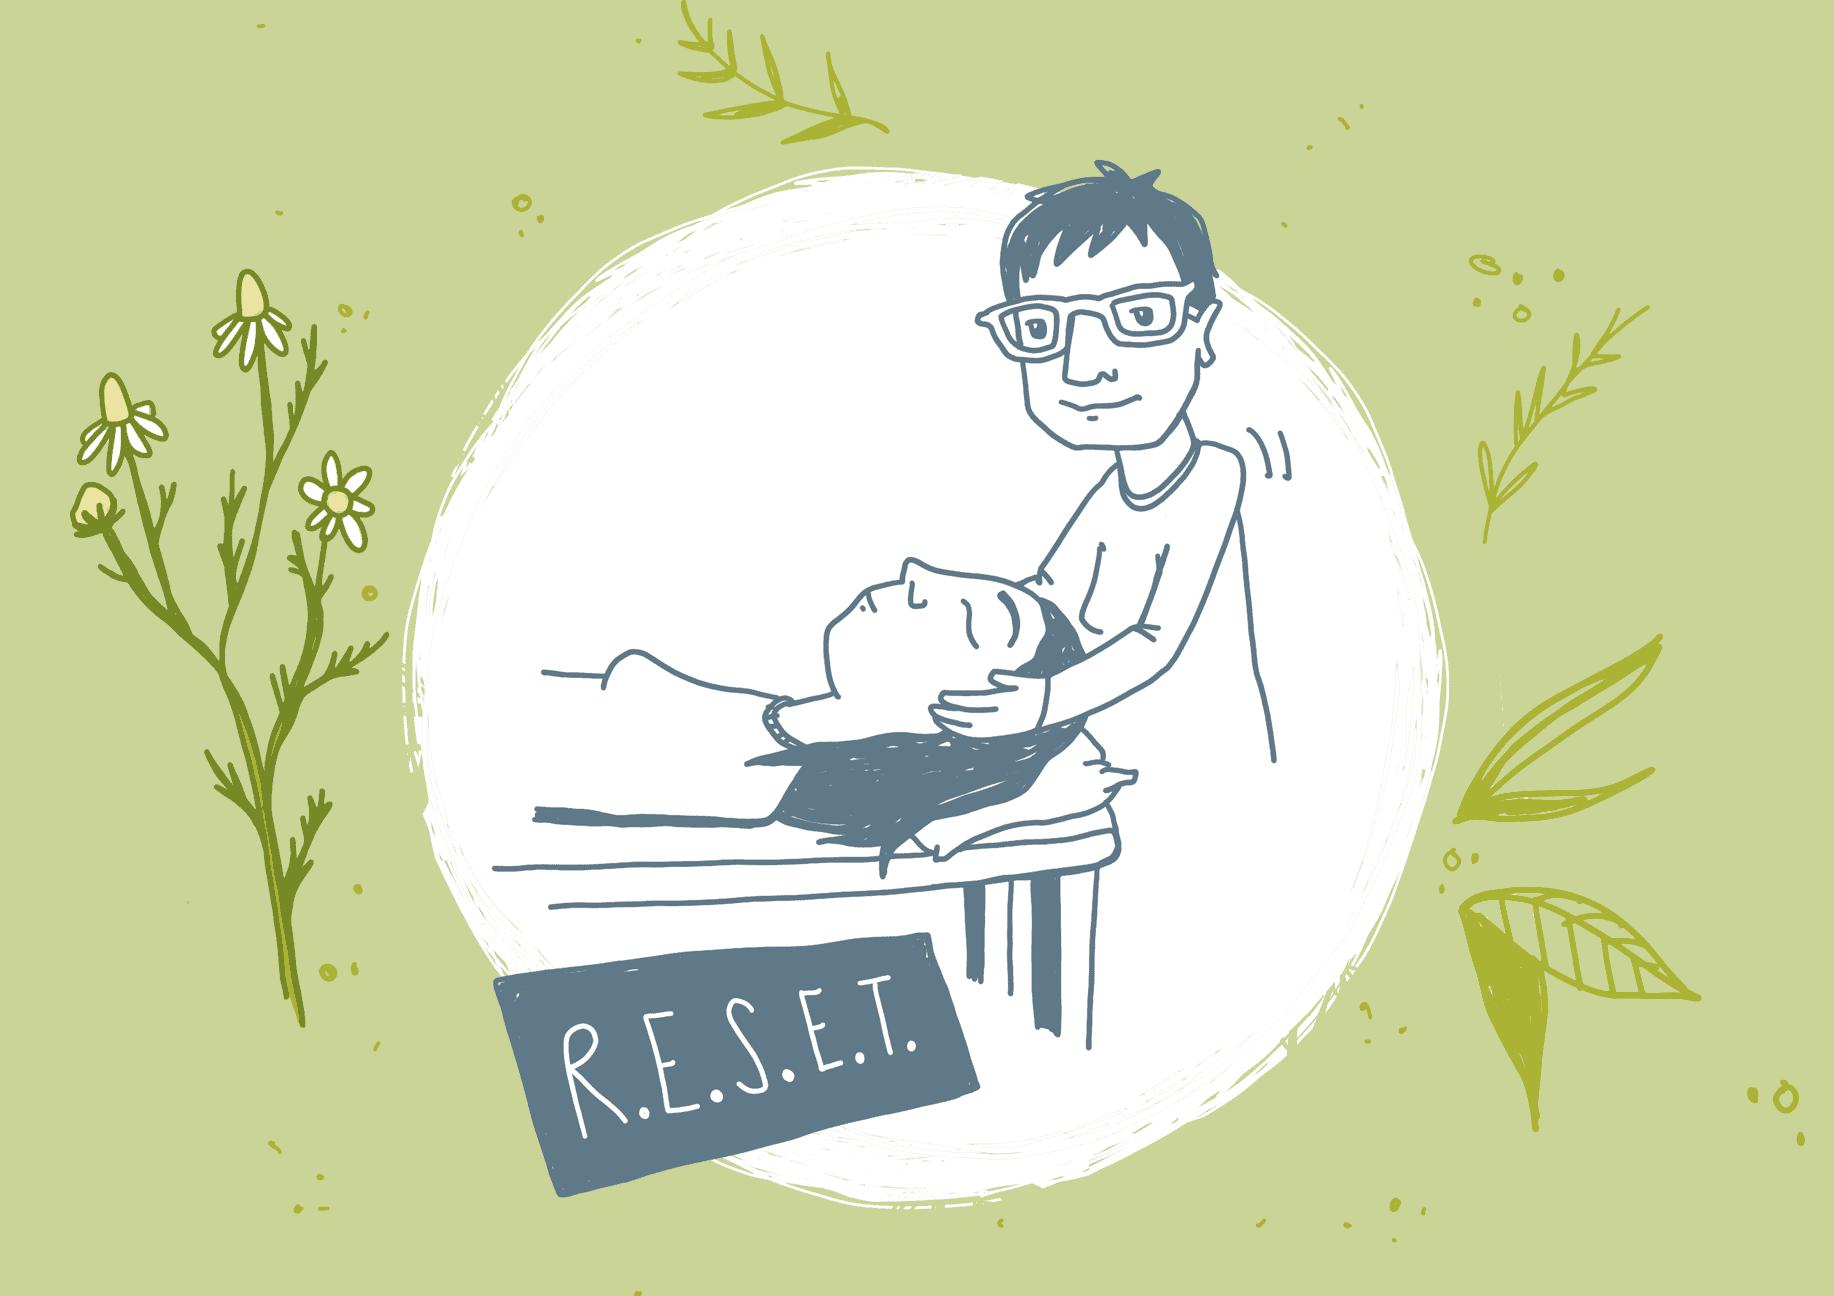 Reset-Kieferbalance